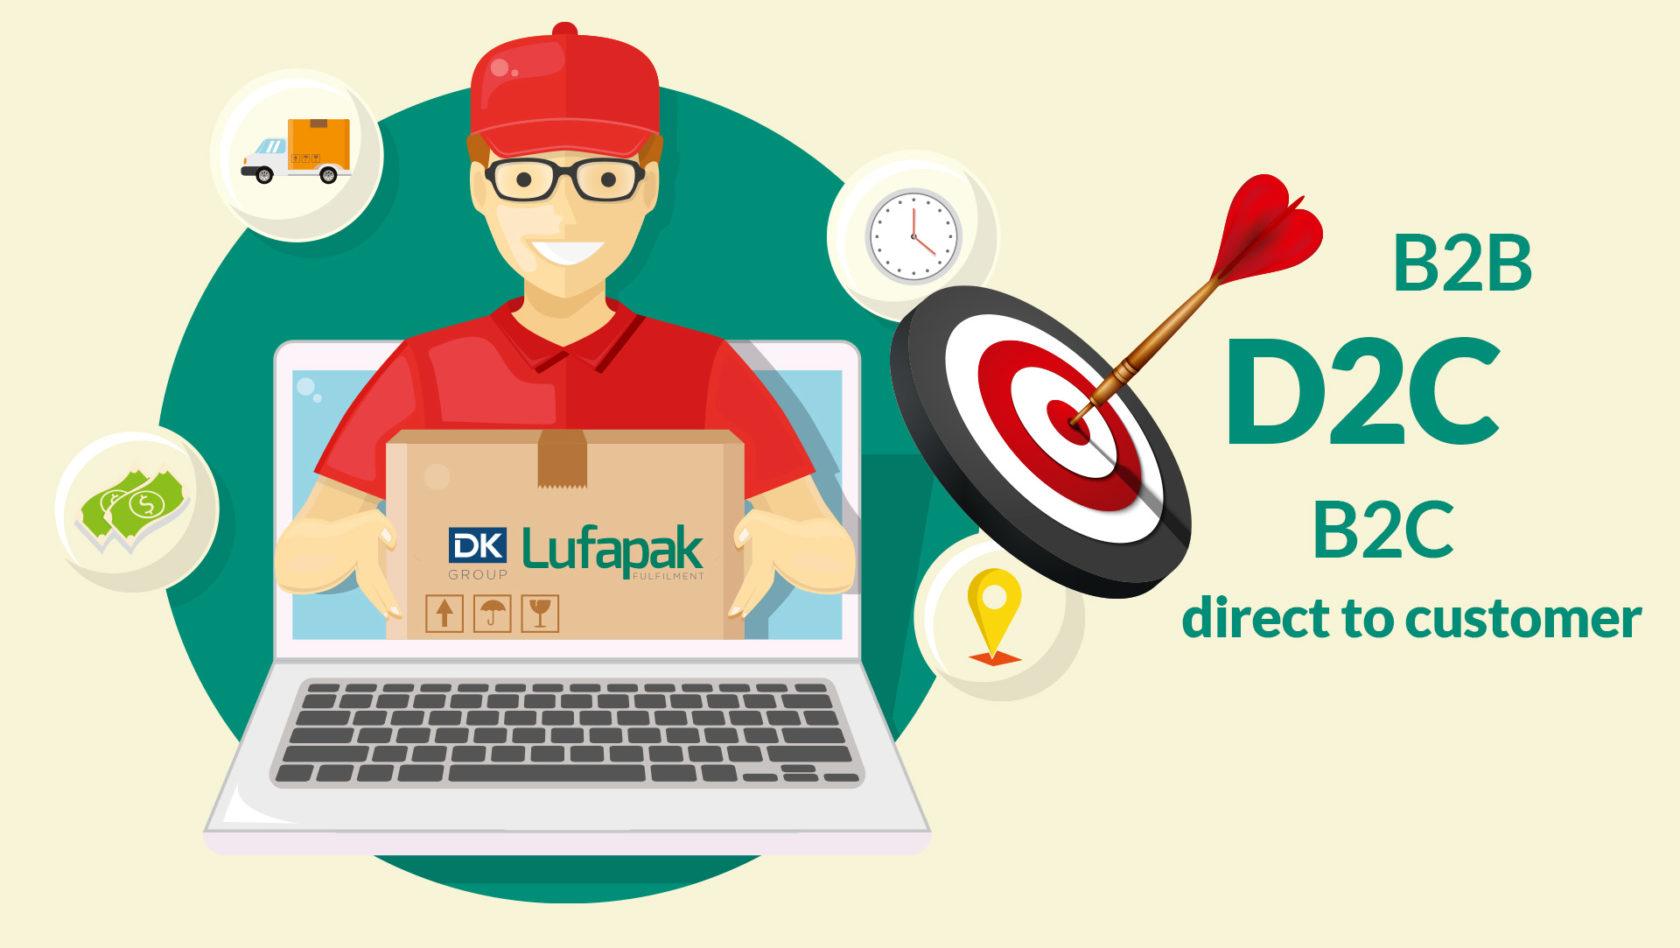 Fulfillment D2c Vertrieb B2c B2b Direct To Customer